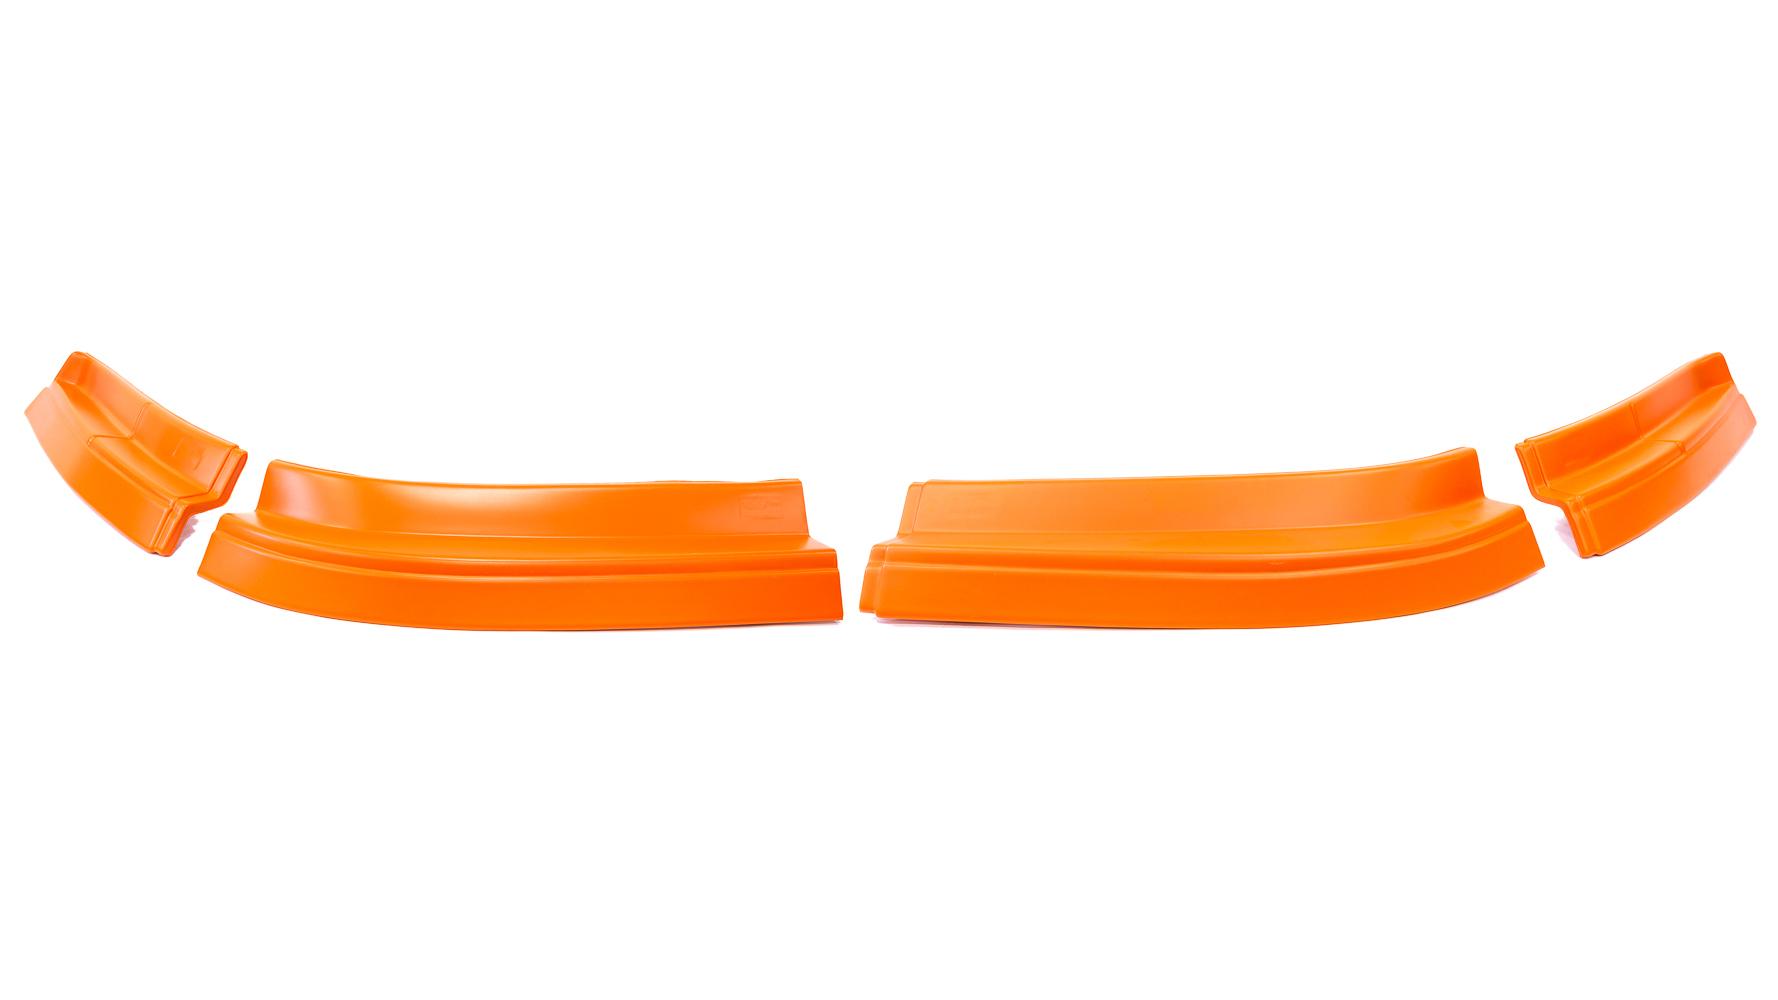 Fivestar Lower Valance MD3 Evo DLM Orange